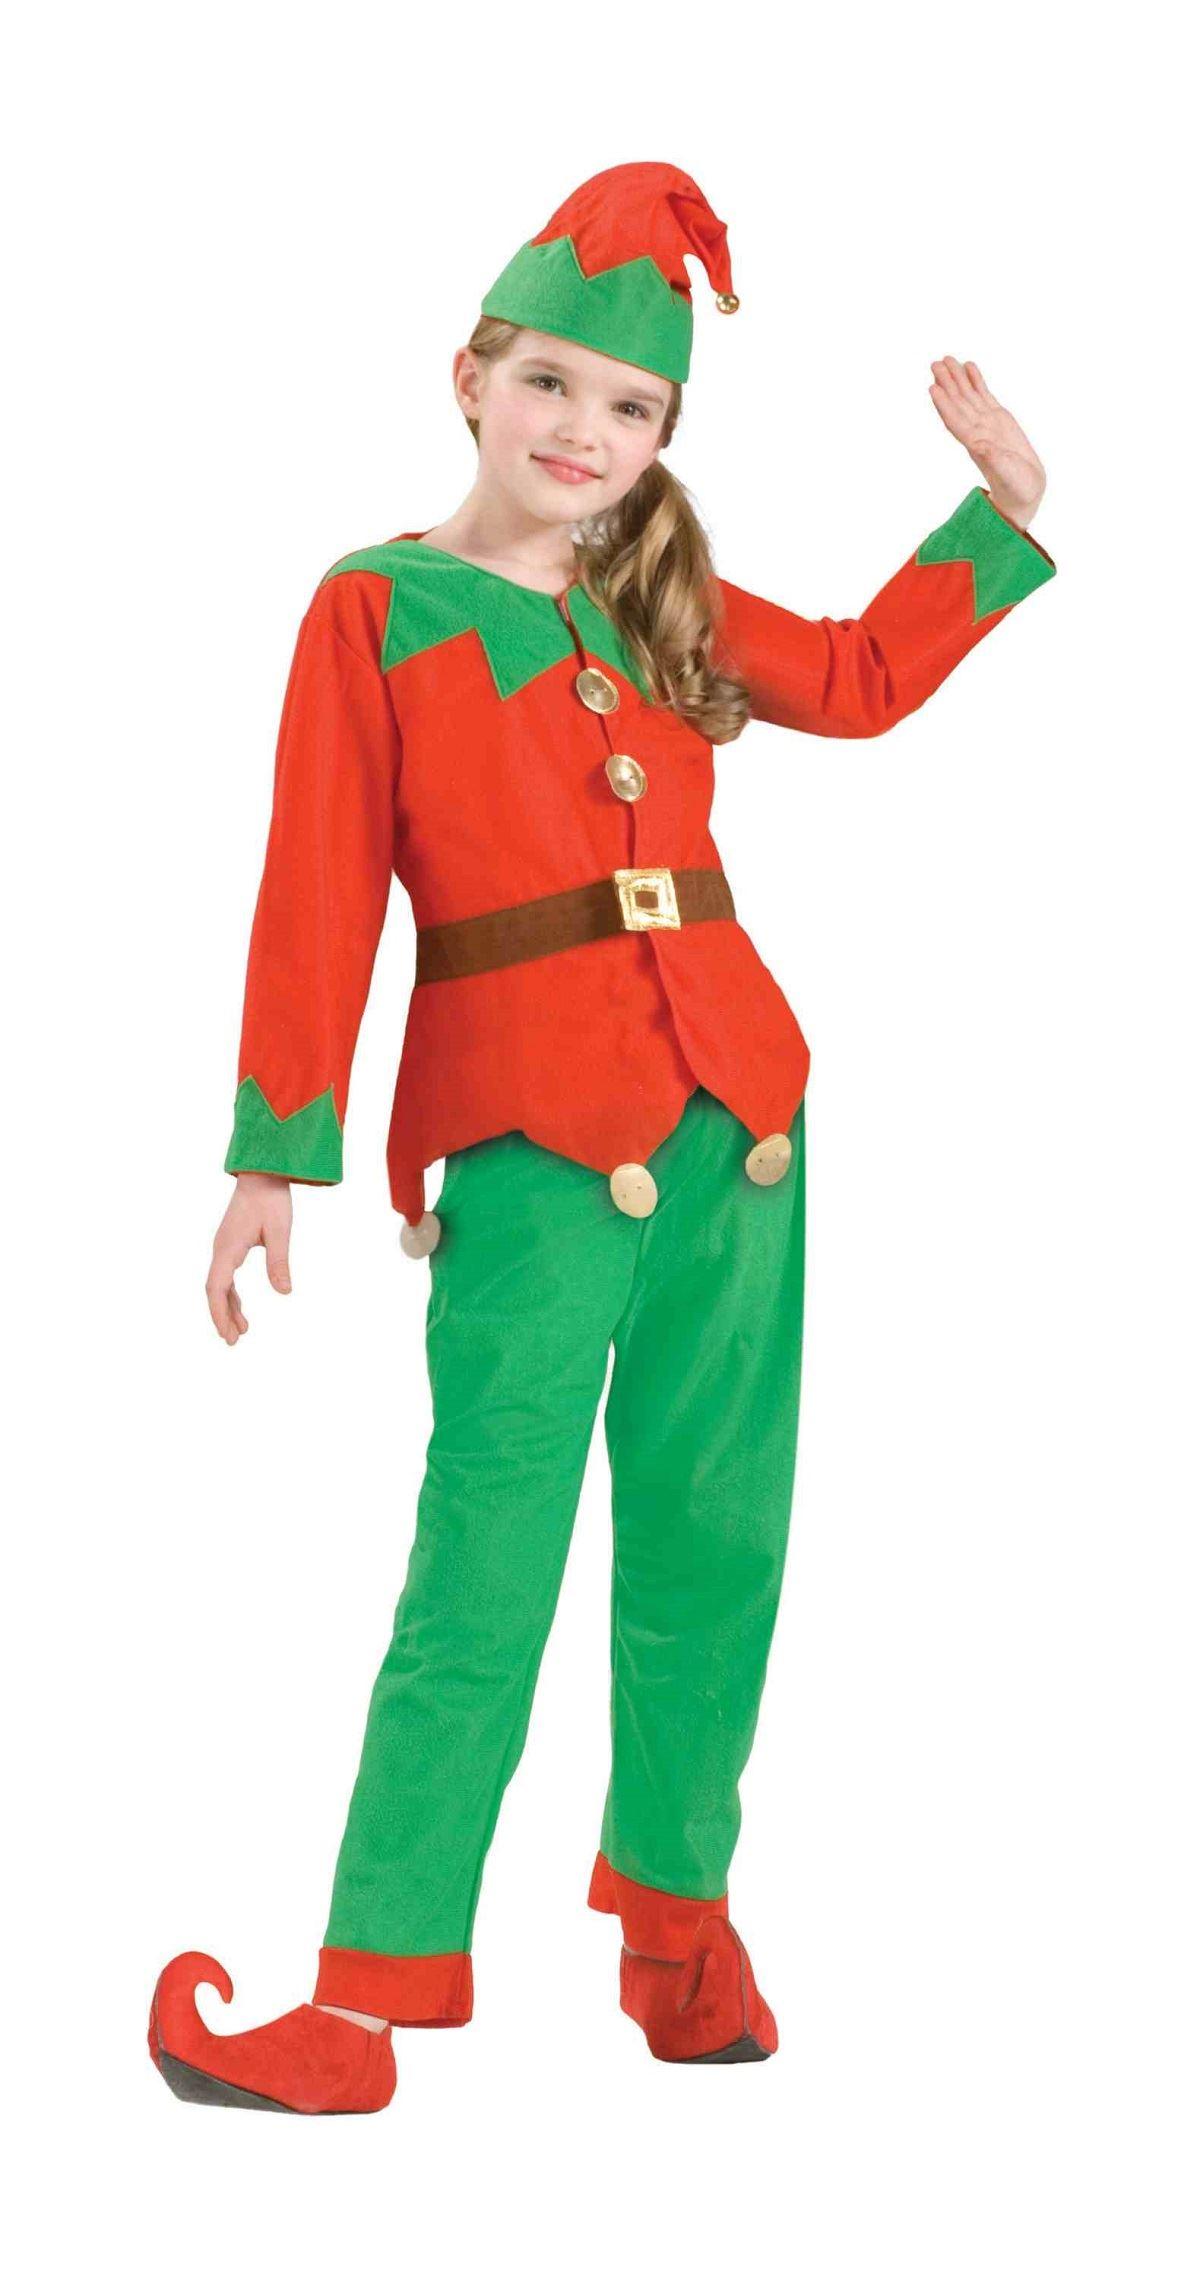 Kids Unisex Simply Elf Costume ...  sc 1 st  The Costume Land & Kids Unisex Simply Elf Costume   $18.99   The Costume Land